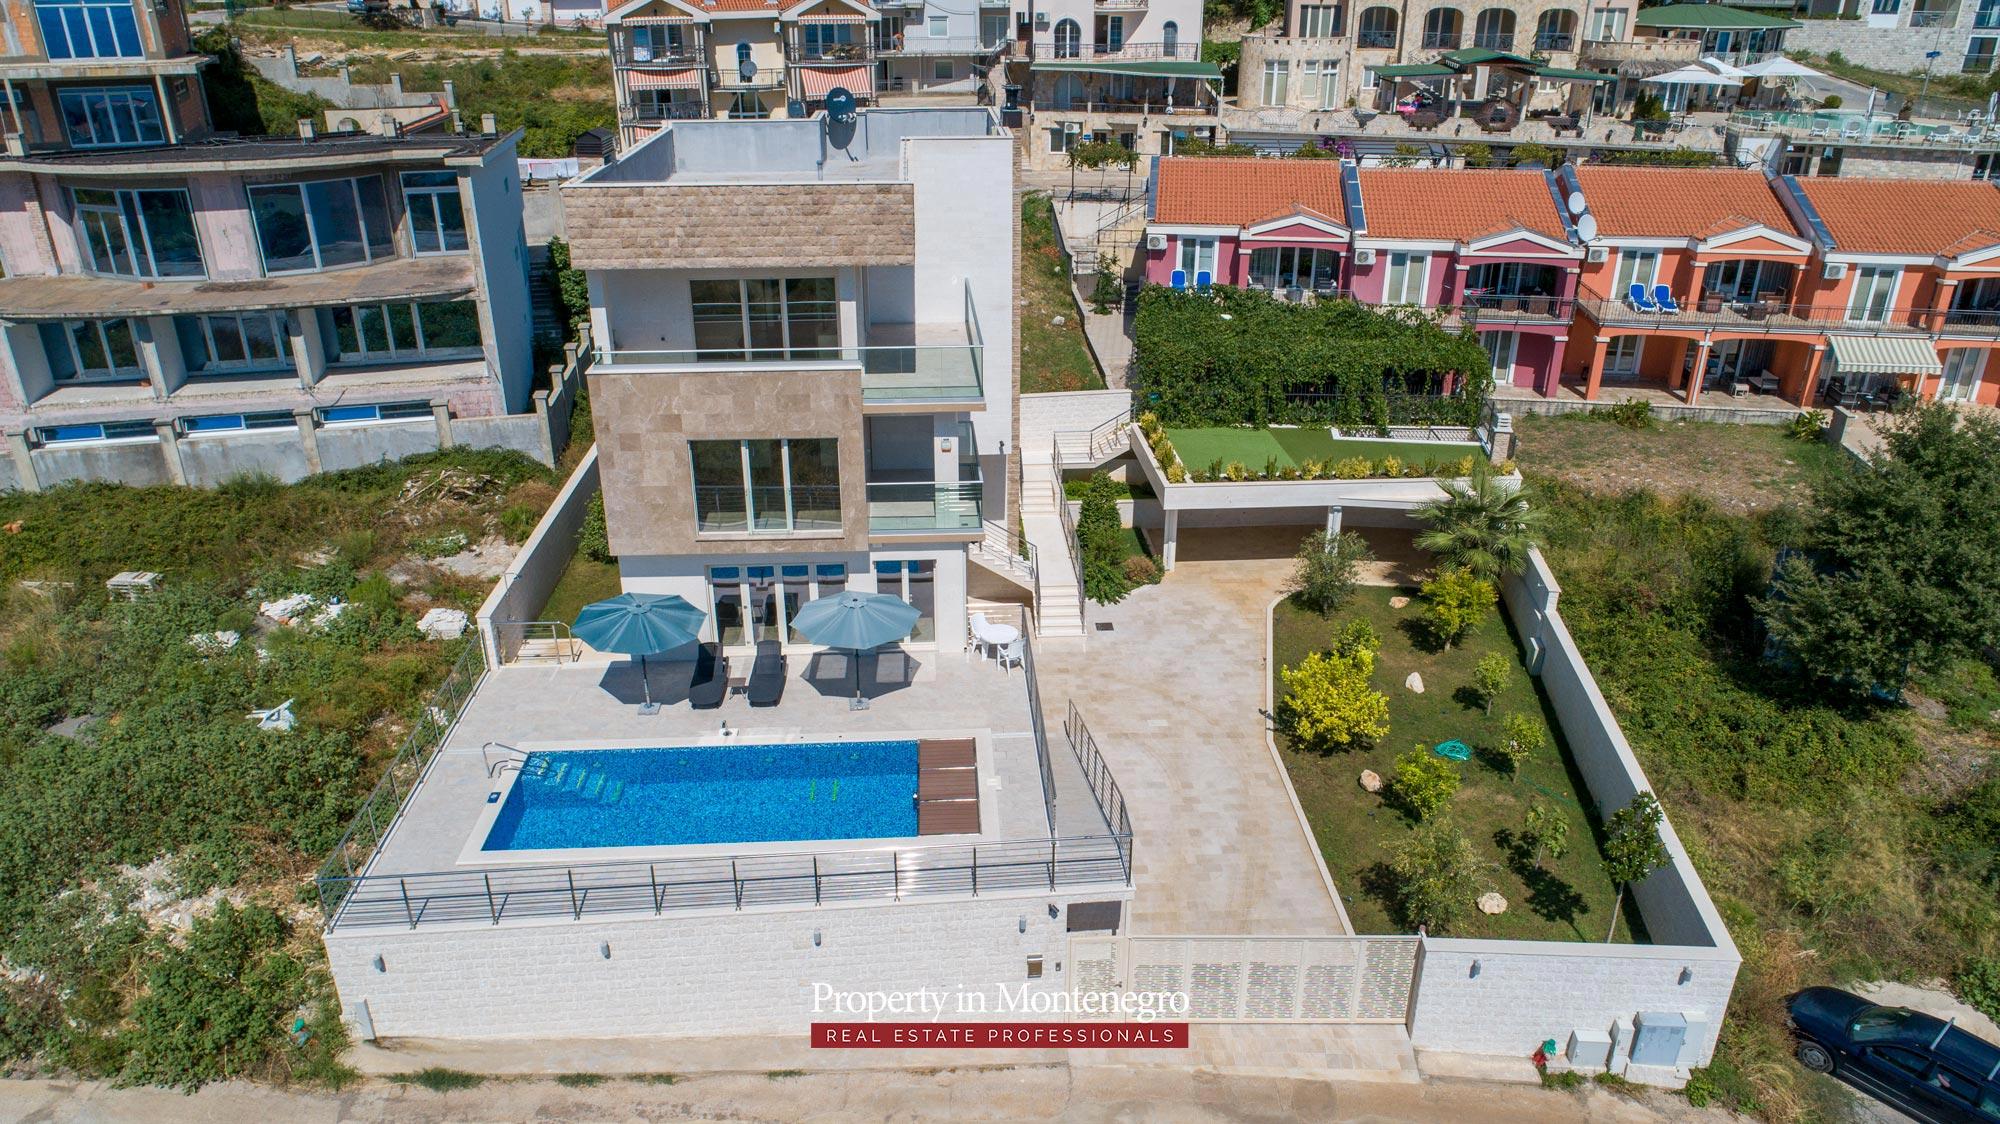 luxury-villa-with-swimming-pool-for-sale-in-Budva (1).jpg